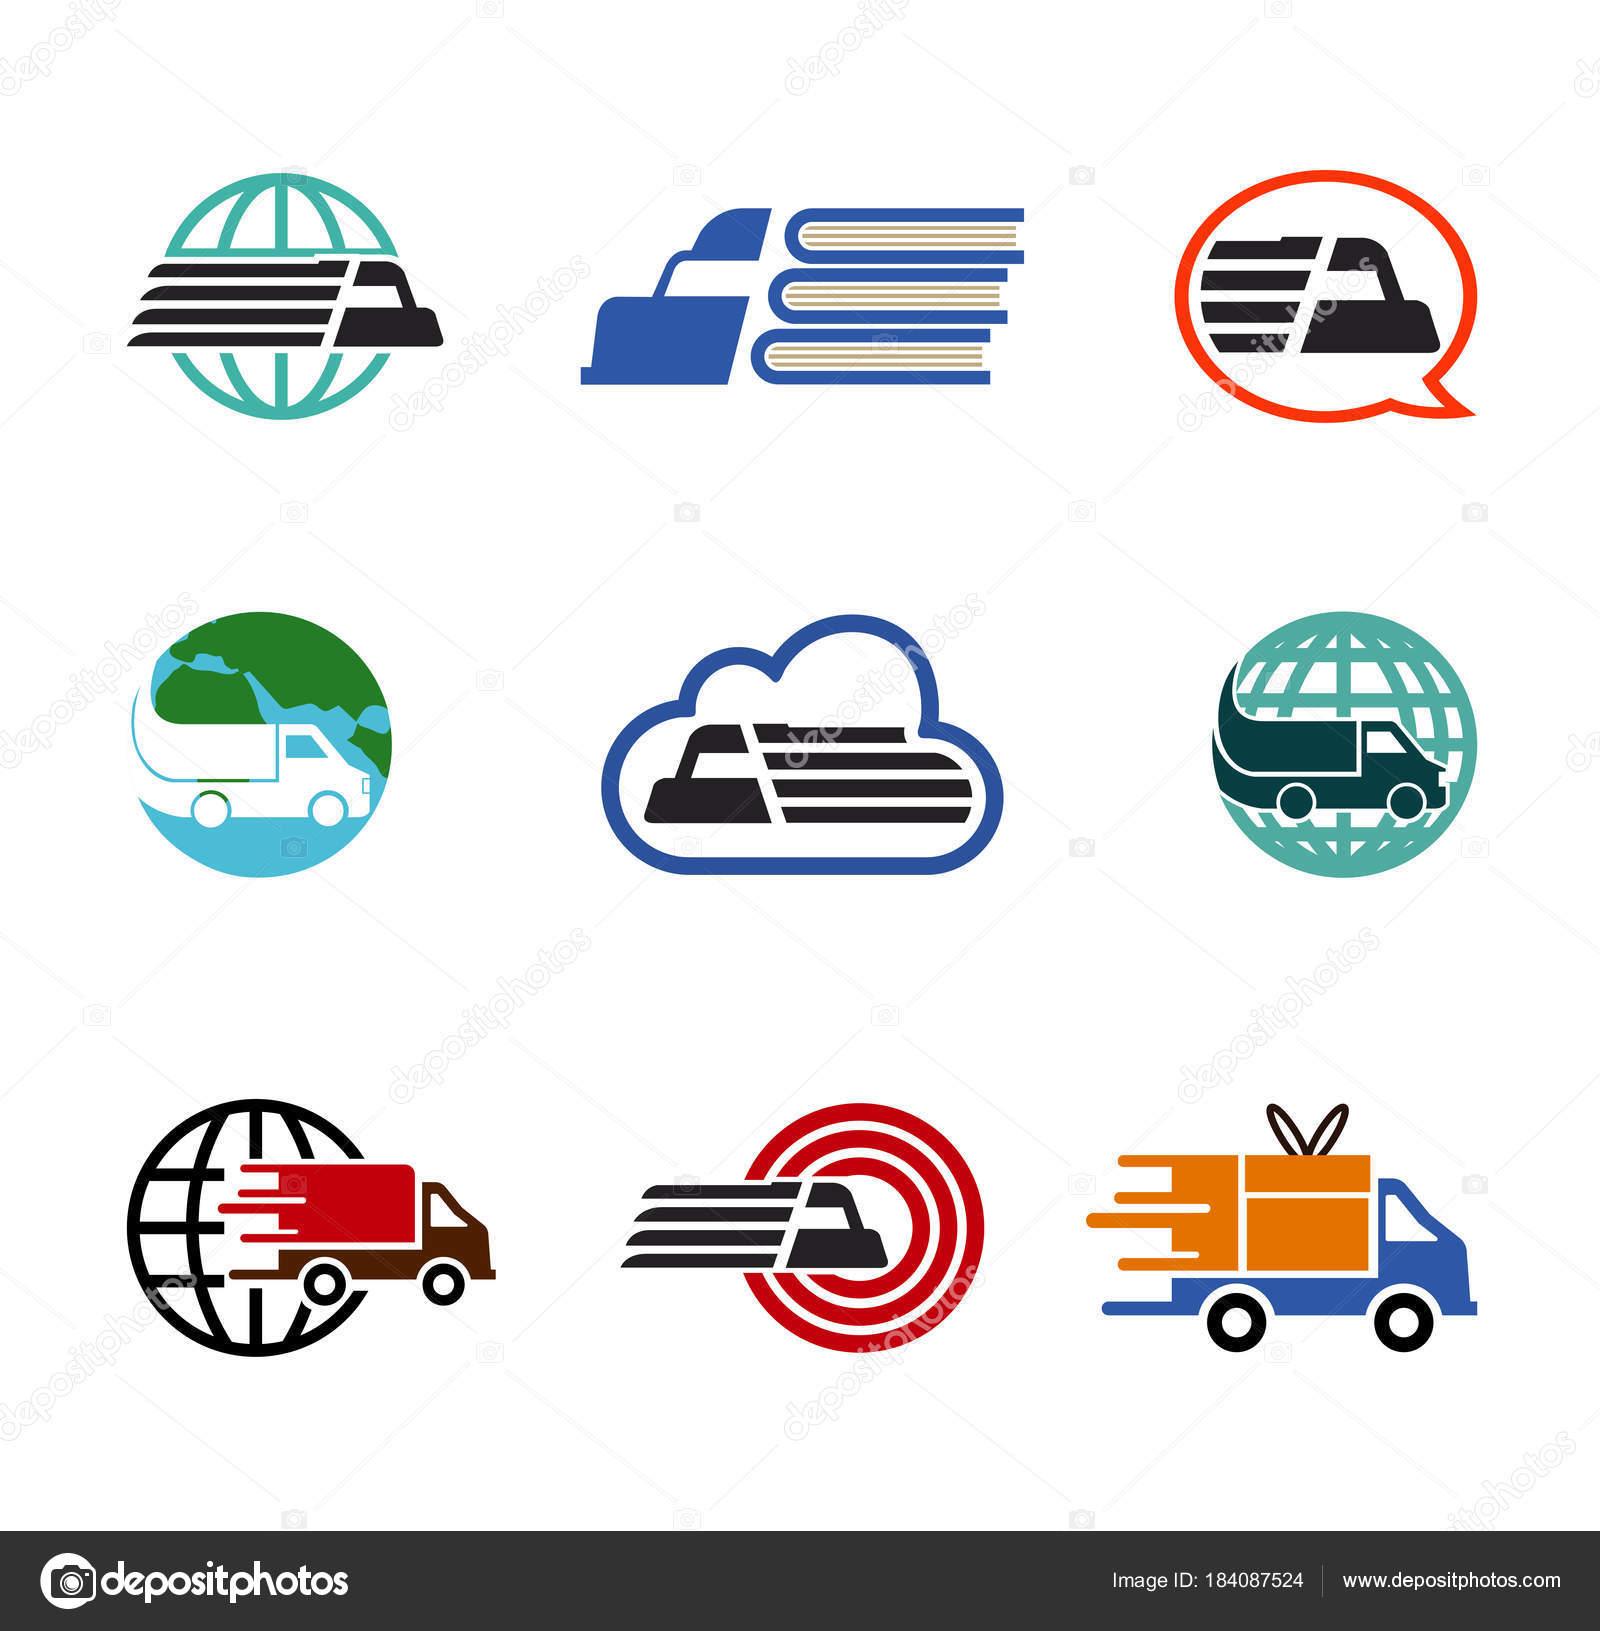 transporation symbol logo design illustration stock vector